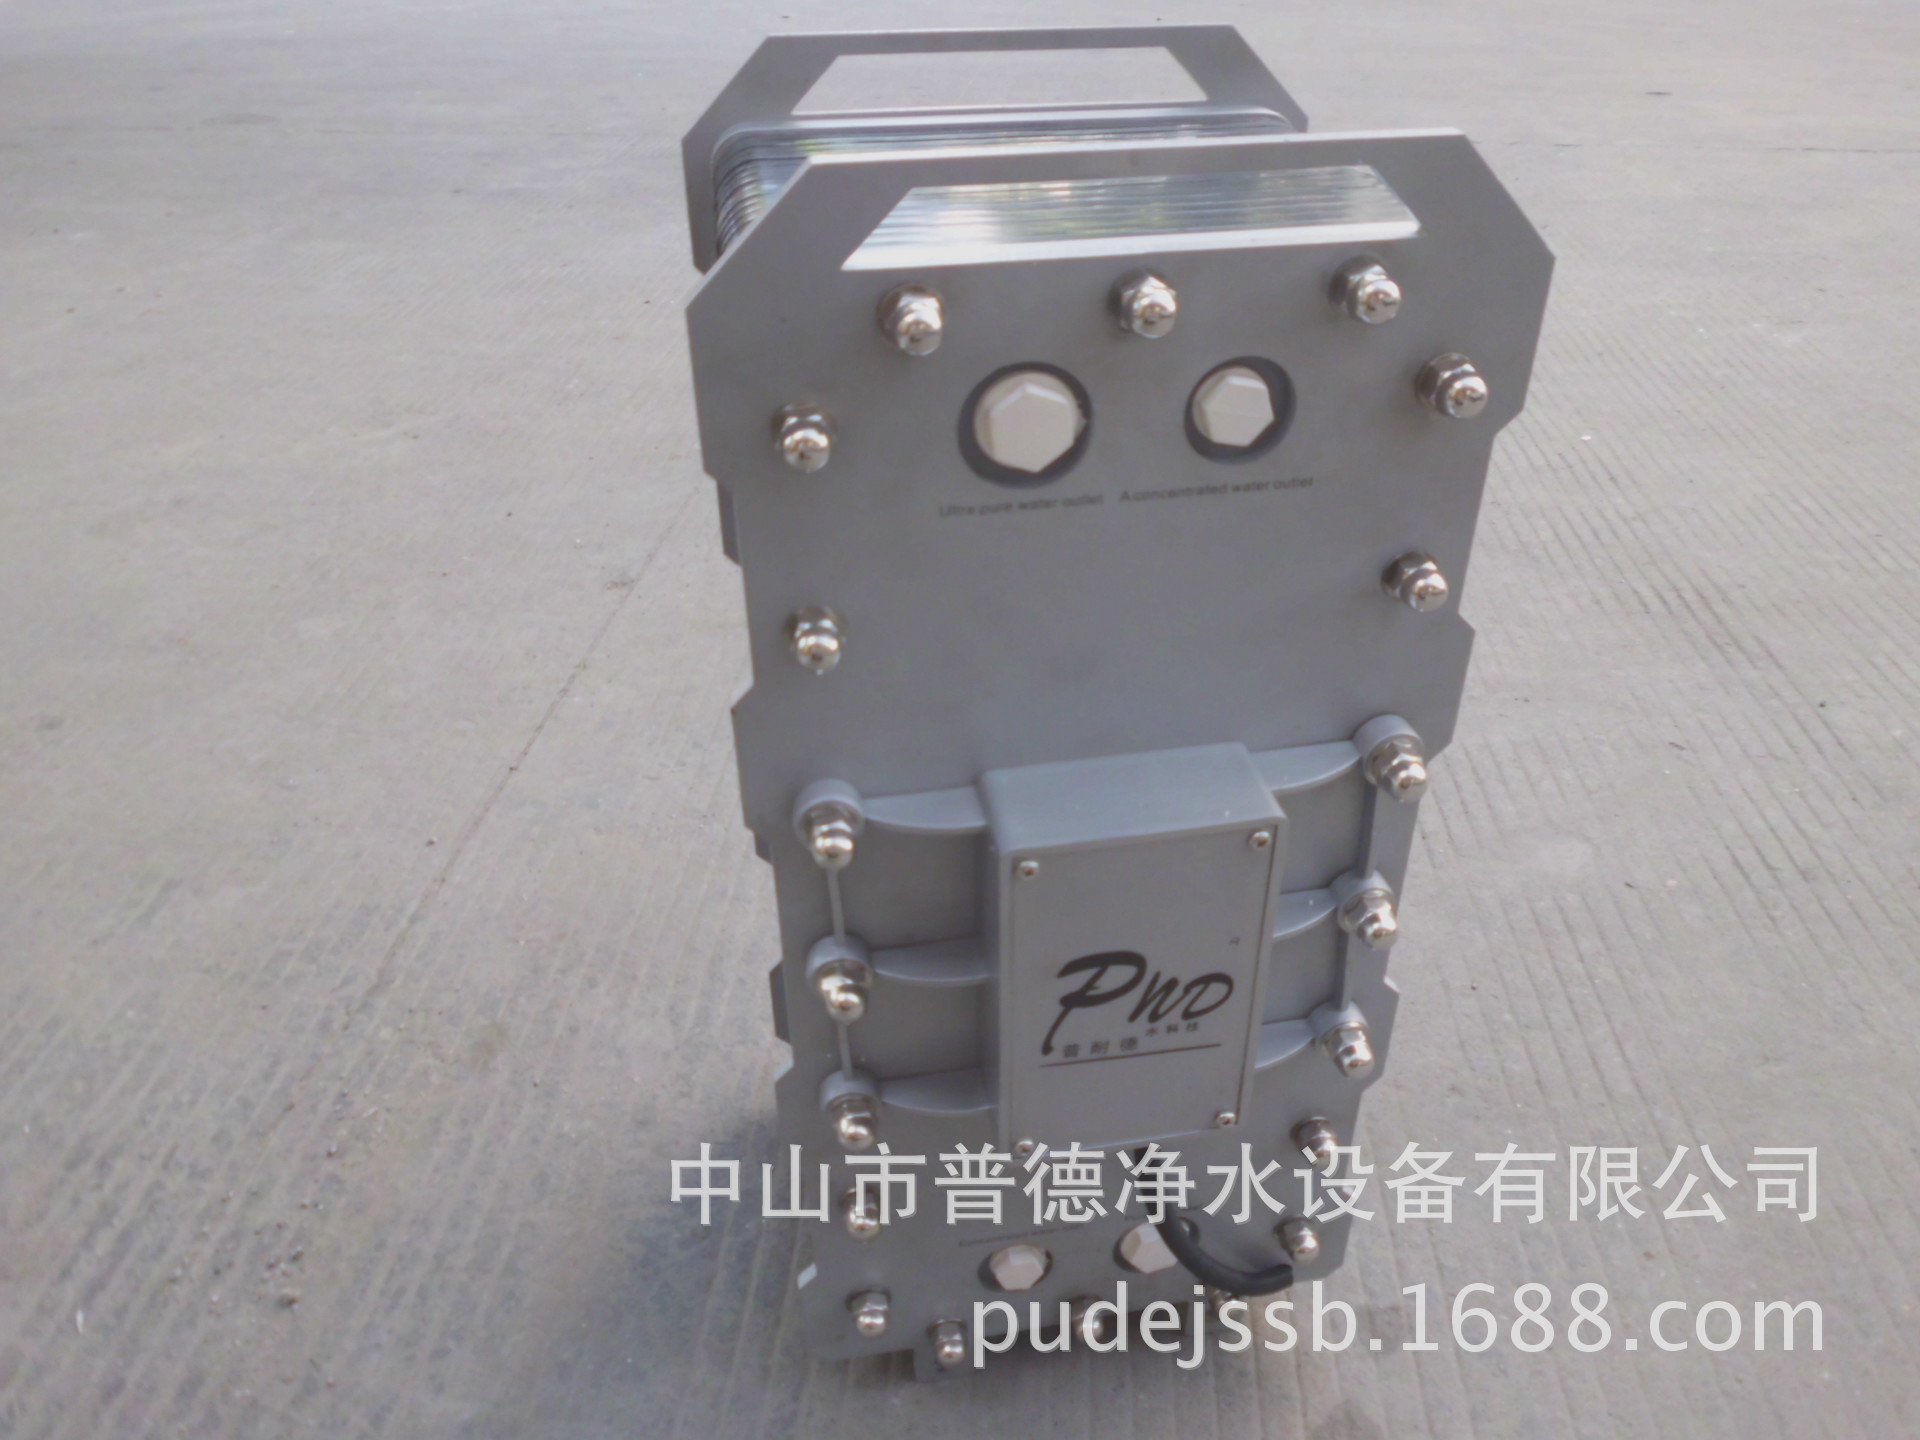 PND-3000L超纯水EDI设备,普德净水设备厂家售后完善